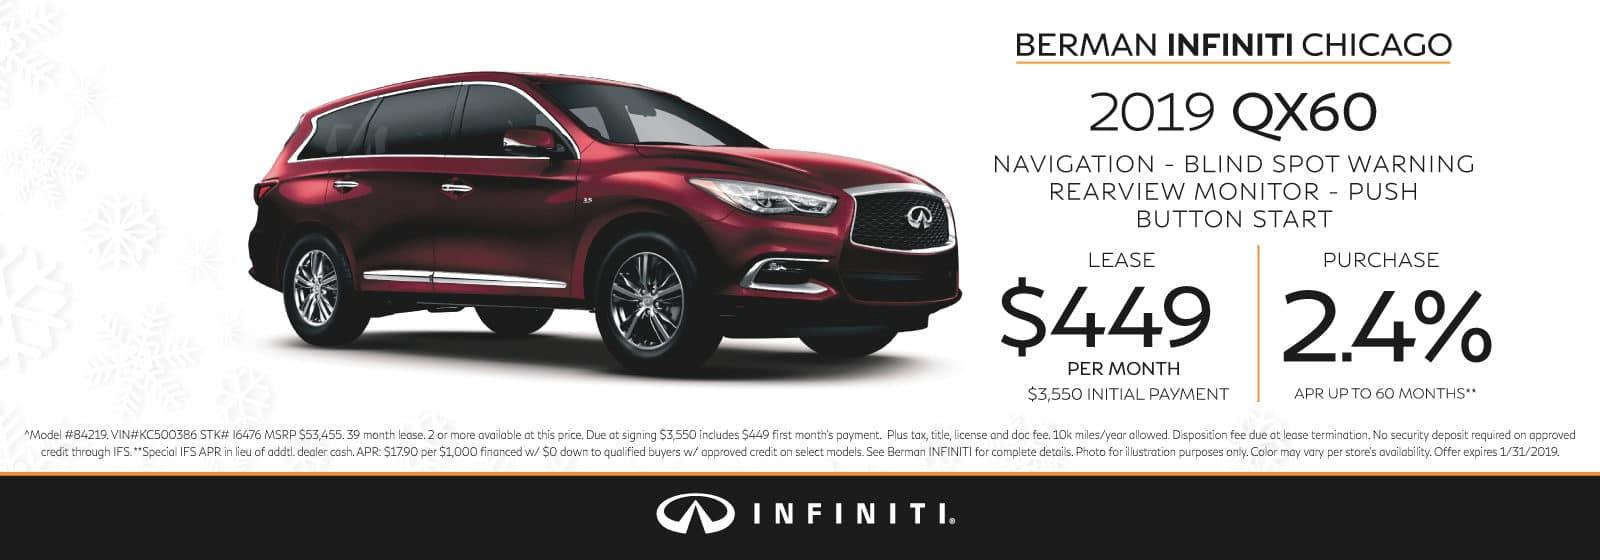 New 2019 INFINITI QX60 January offer at Berman INFINITI Chicago!